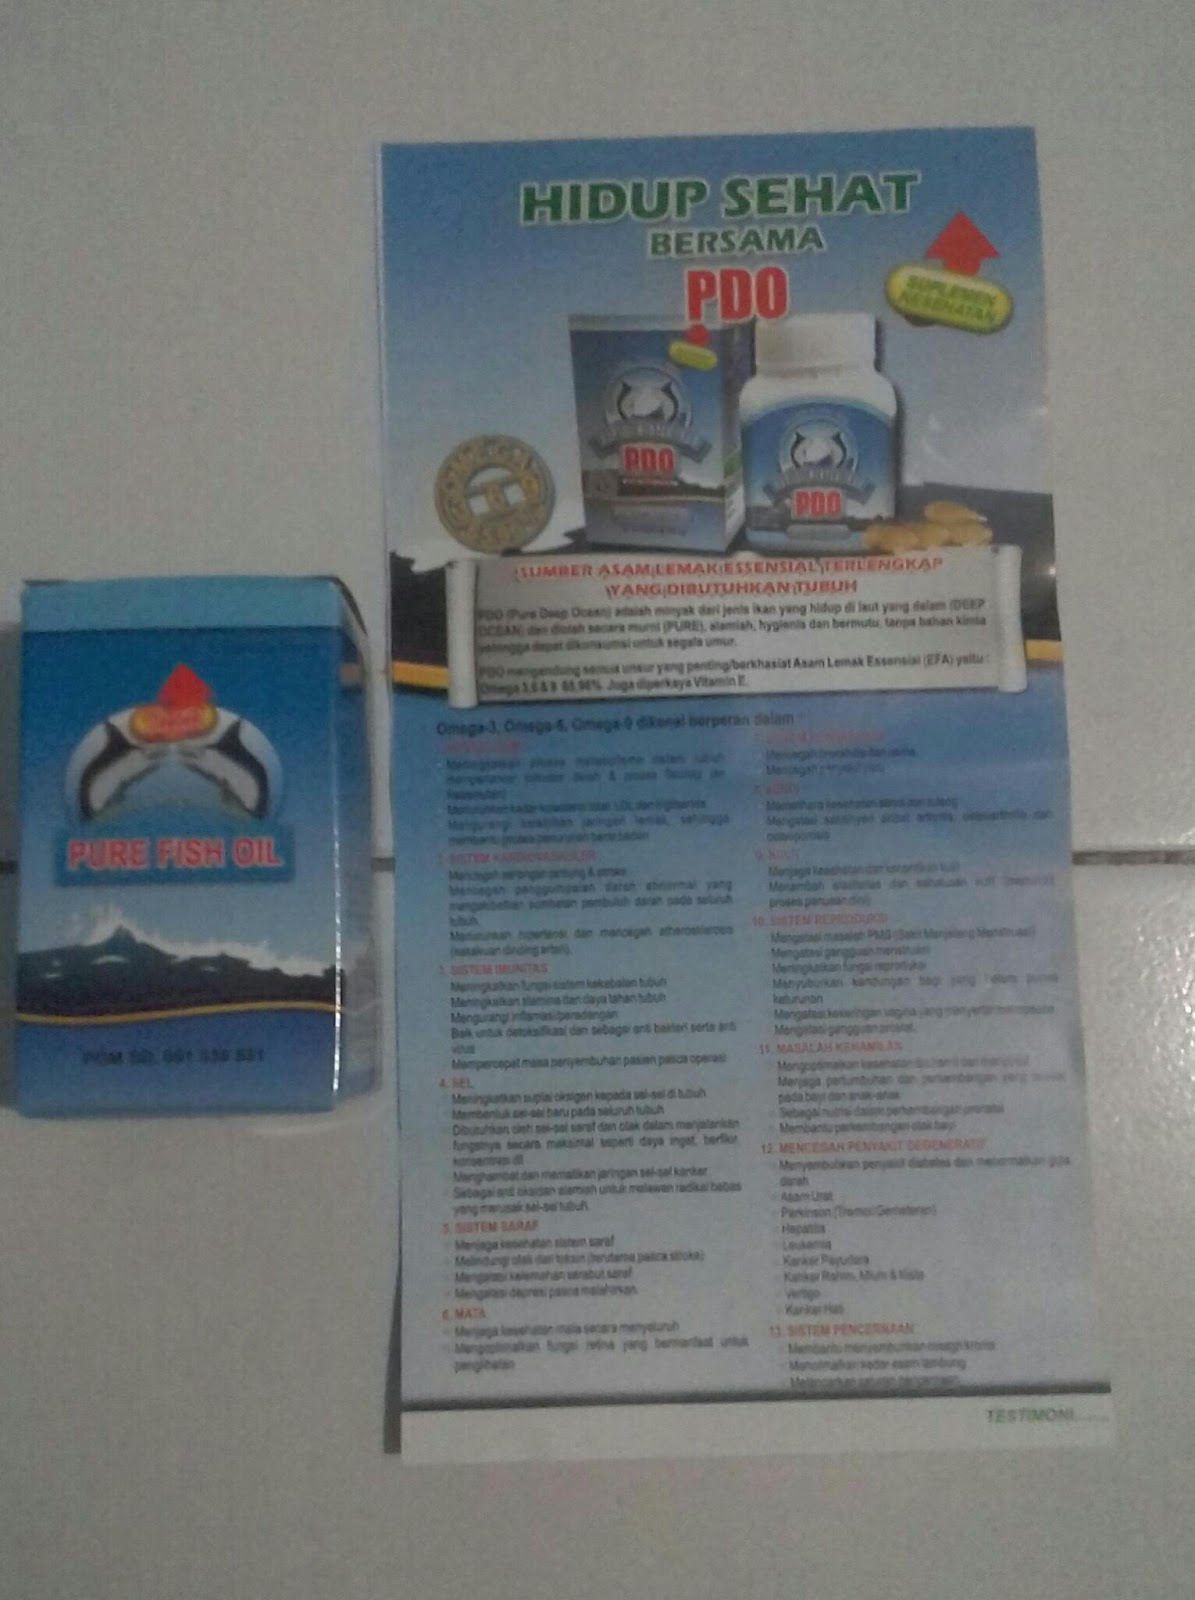 Kumpulan Nasehat Dan Kisah Islami Kapsul Minyak Ikan Ini Dapat Dibeli Di Koperasi Radio Samhan Am 630 Jl 26 Swadaya Raya No143 Radin Intan Duren Sawit Jakarta Timur